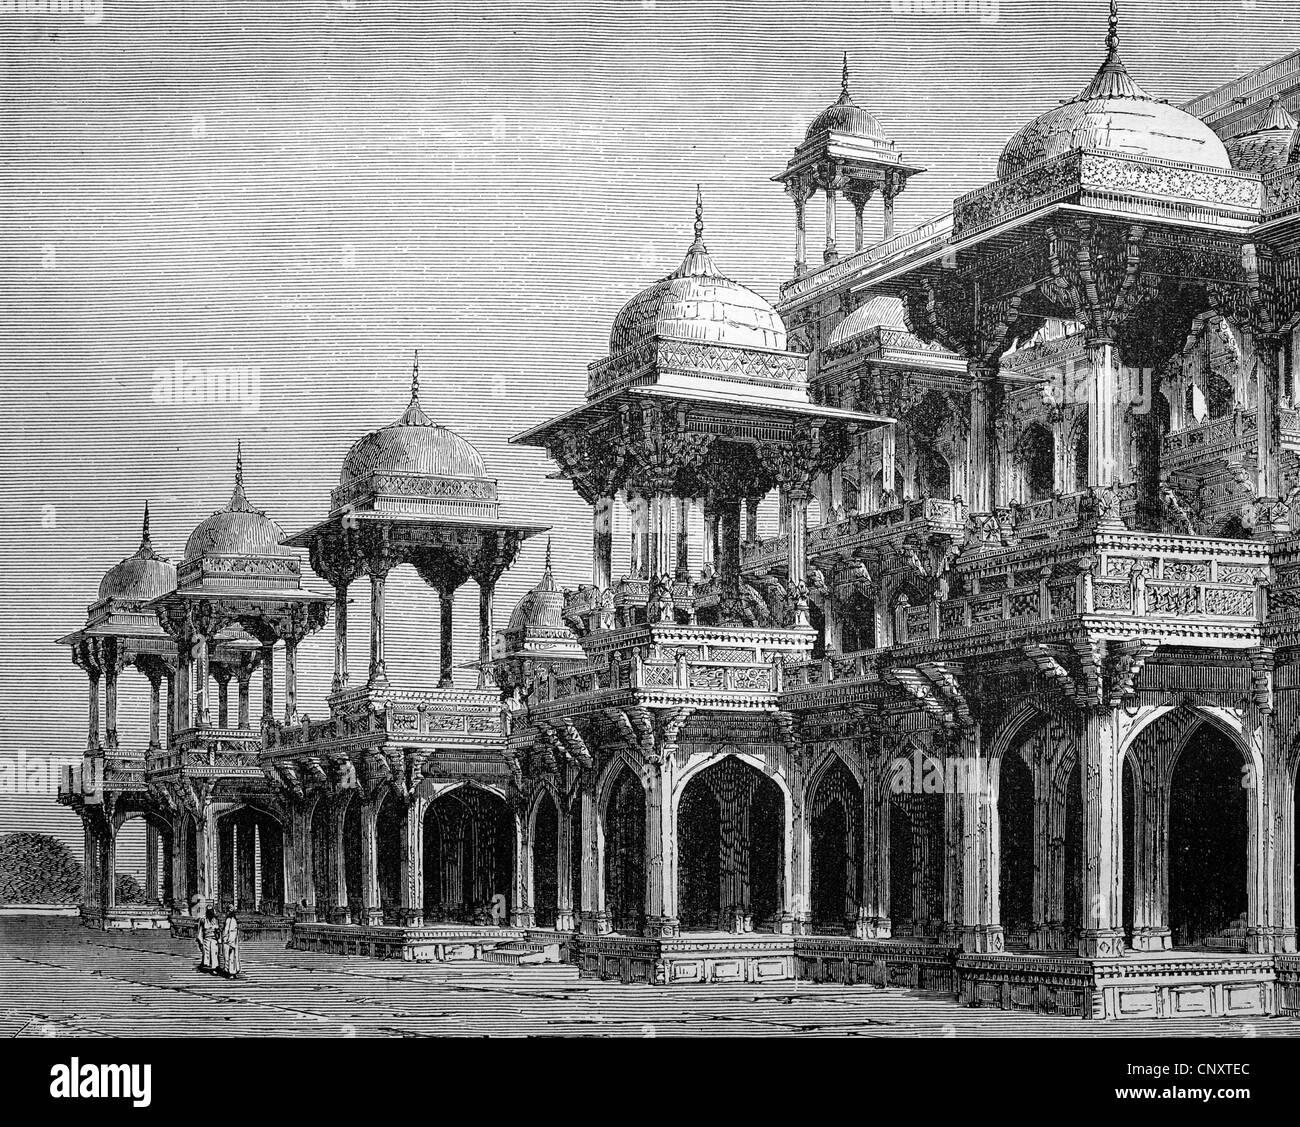 The mausoleum of Emperor Akbar, Agra, India, historical illustration, wood engraving, circa 1888 - Stock Image